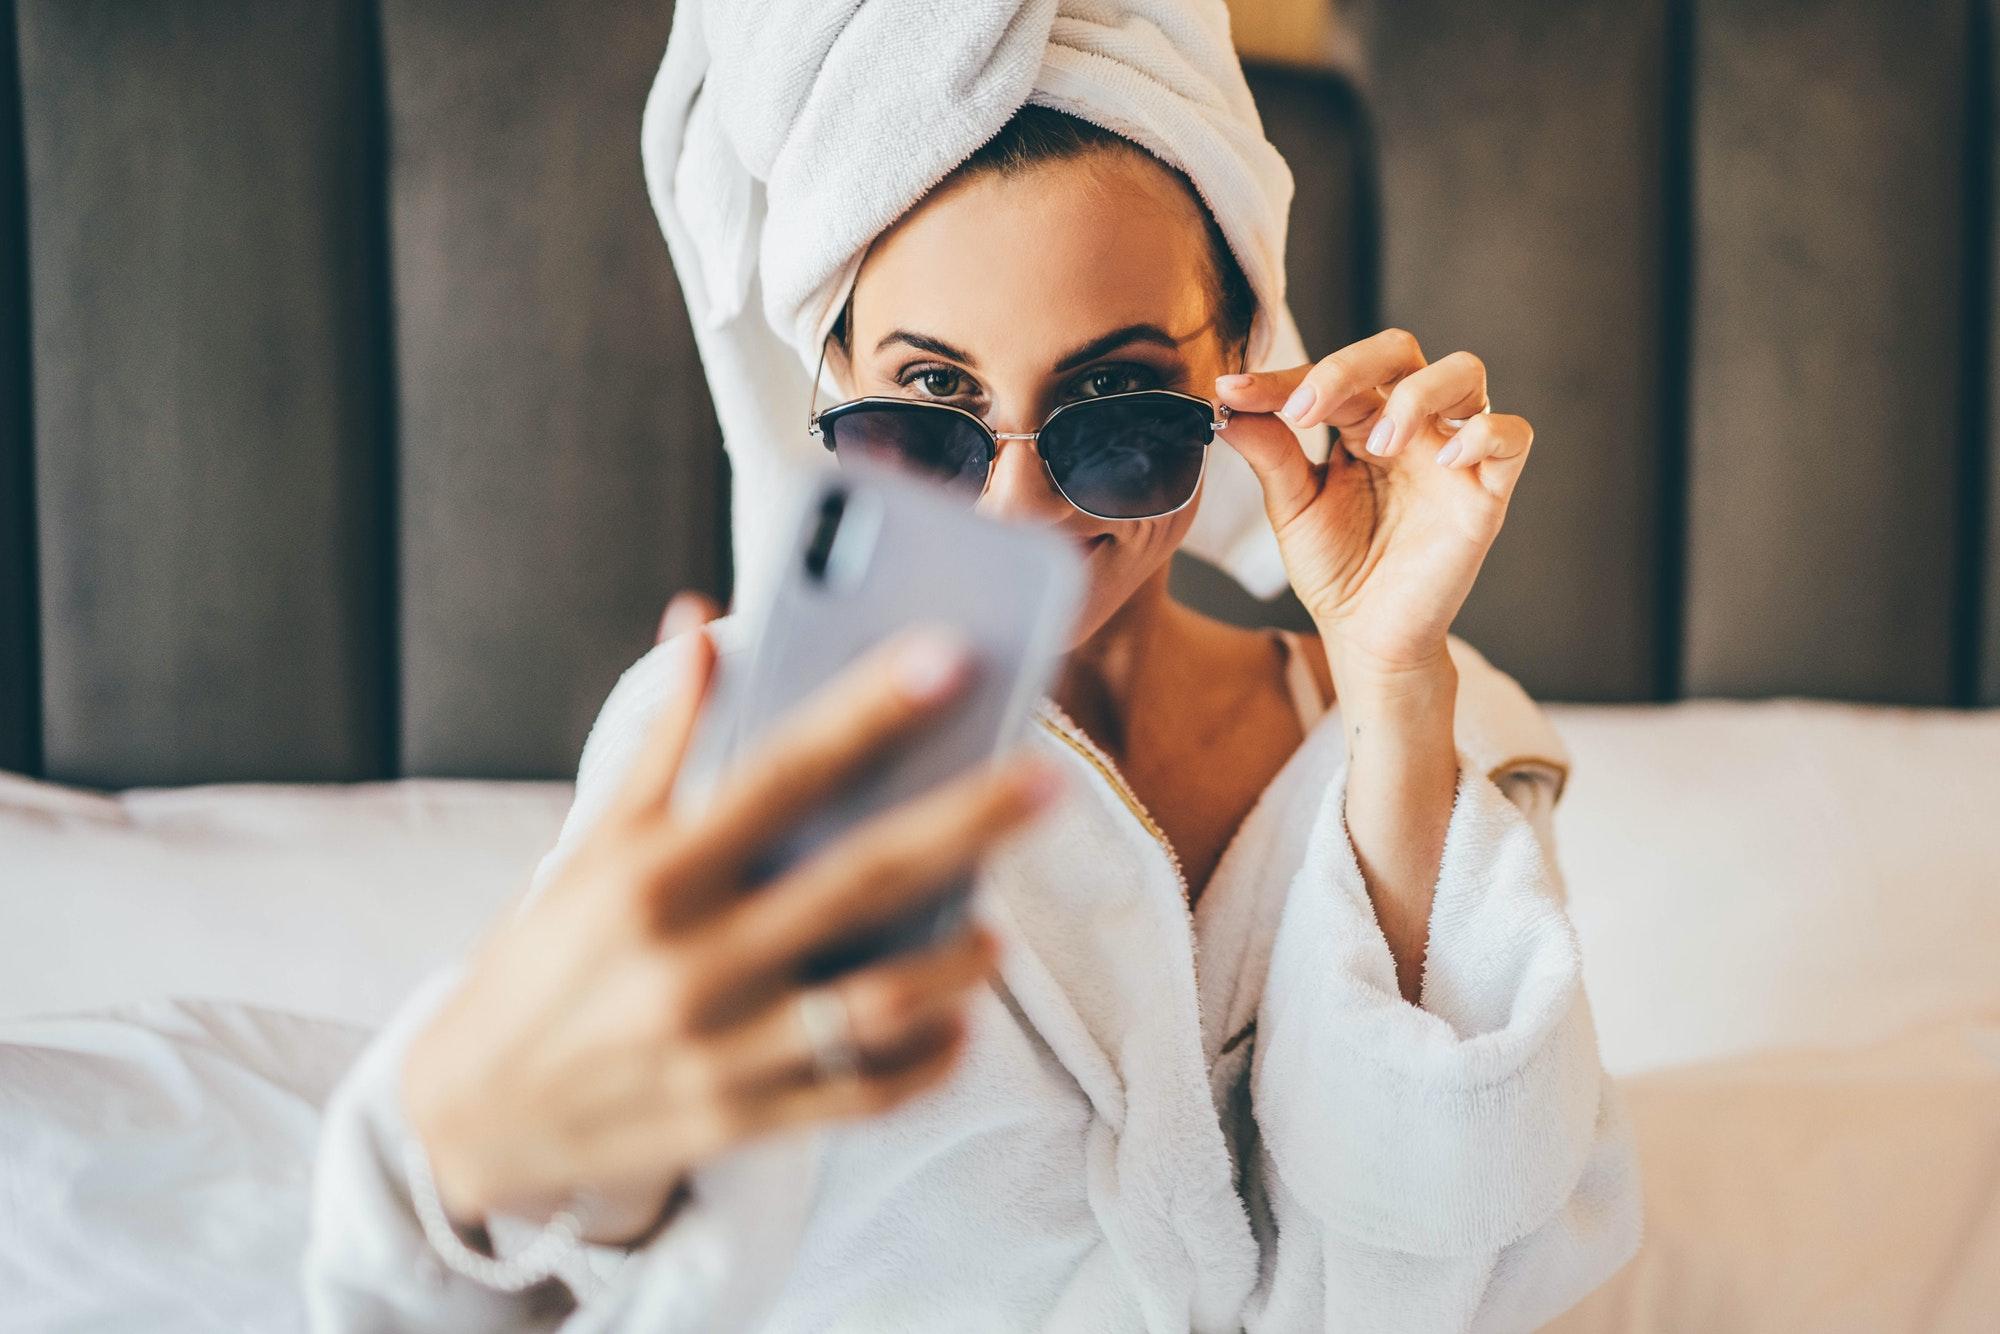 woman in towel and bathrobe sitting, making selfie and having fun